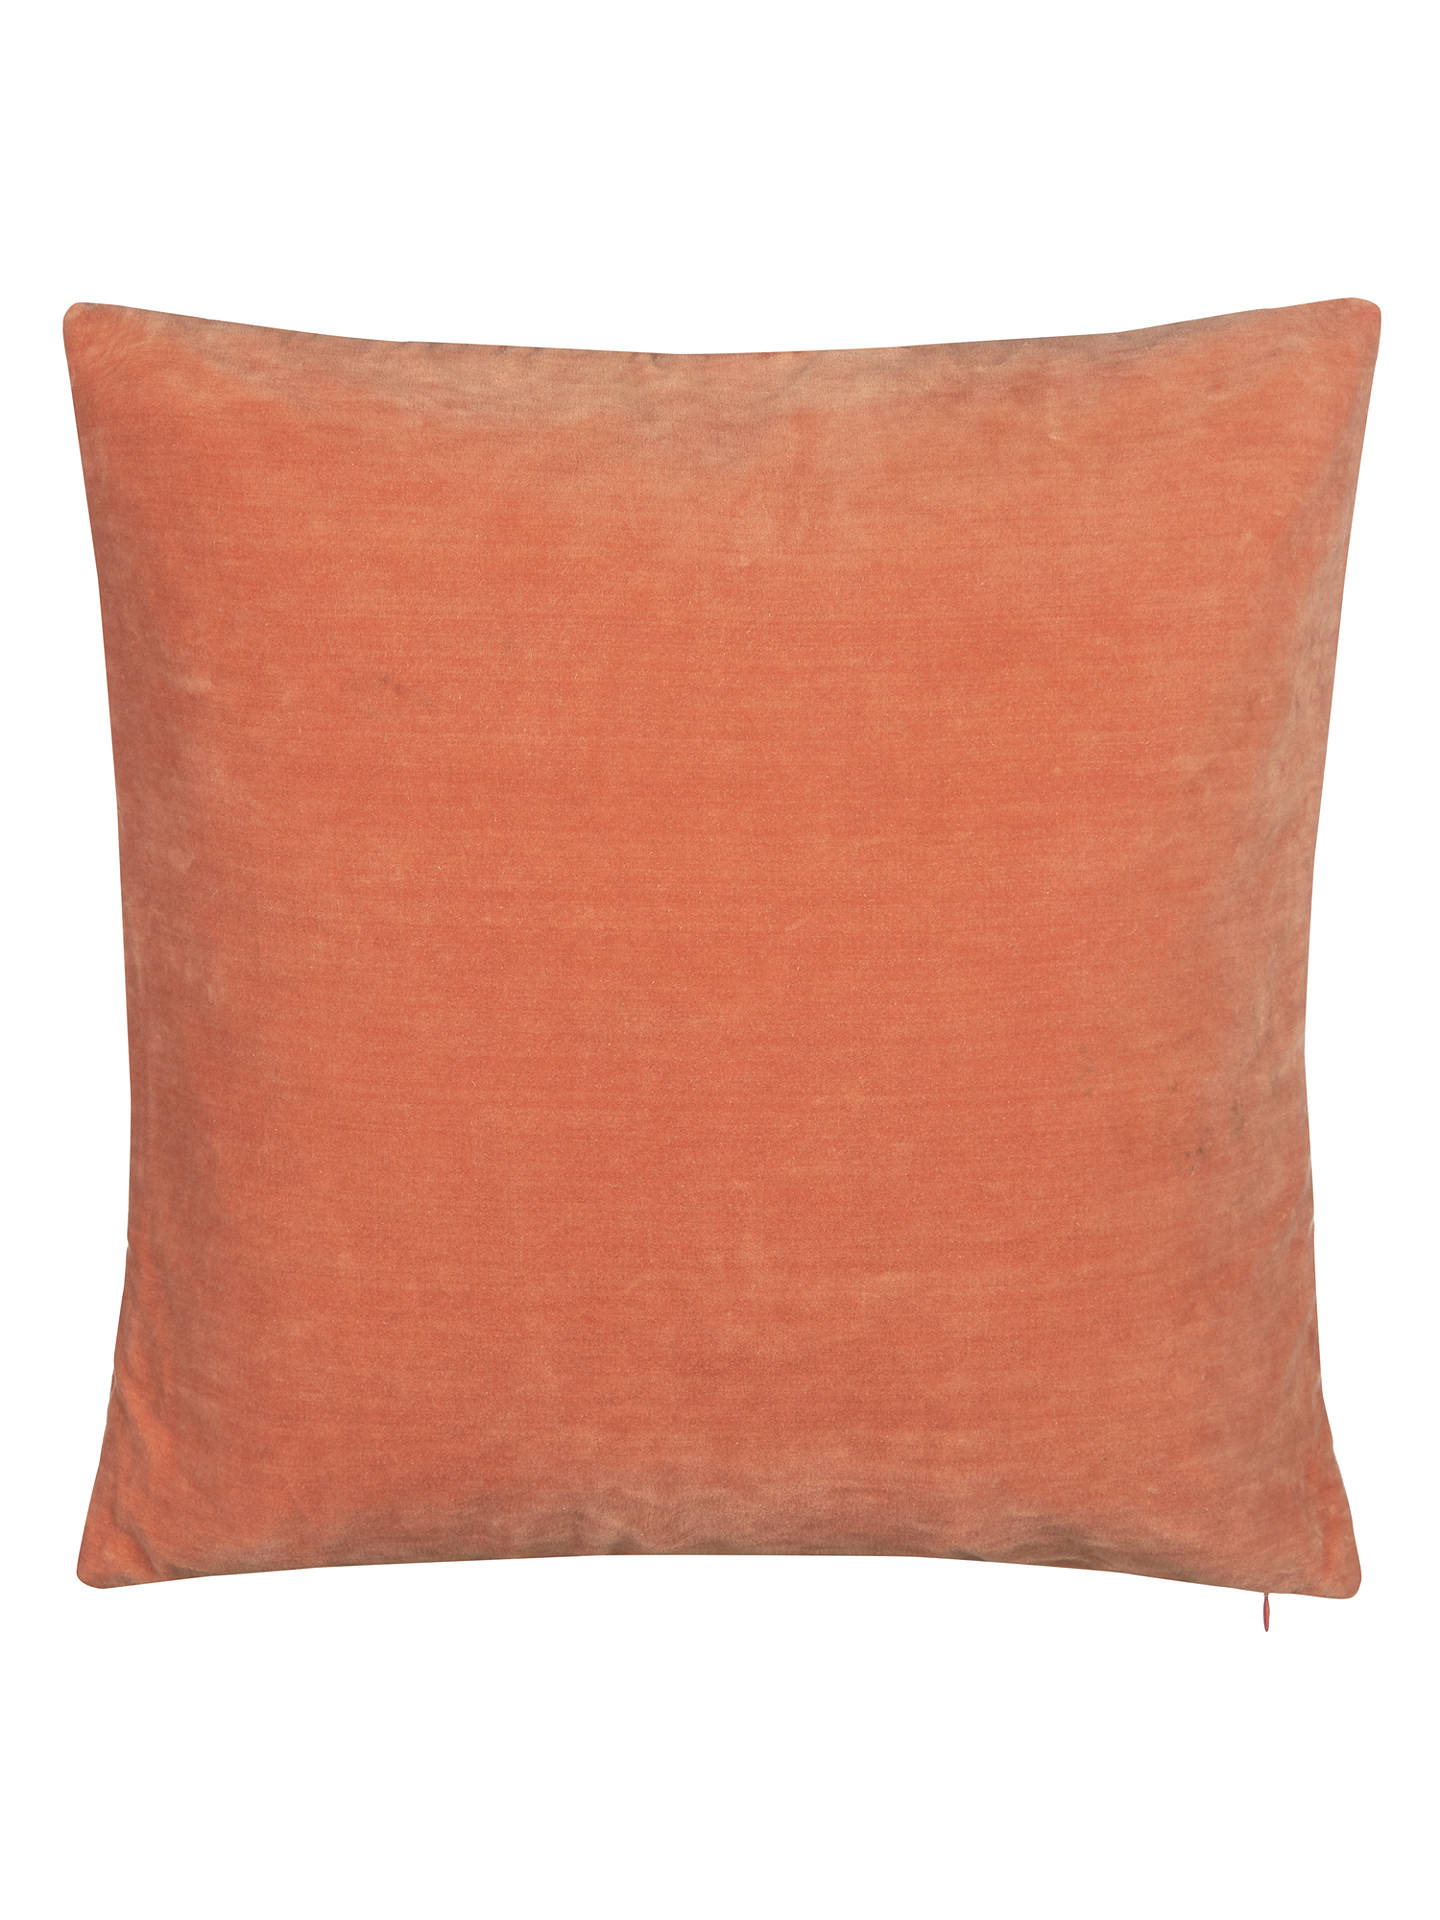 John Lewis Partners Plain Velvet Cushion Cinnabar Online At Johnlewis